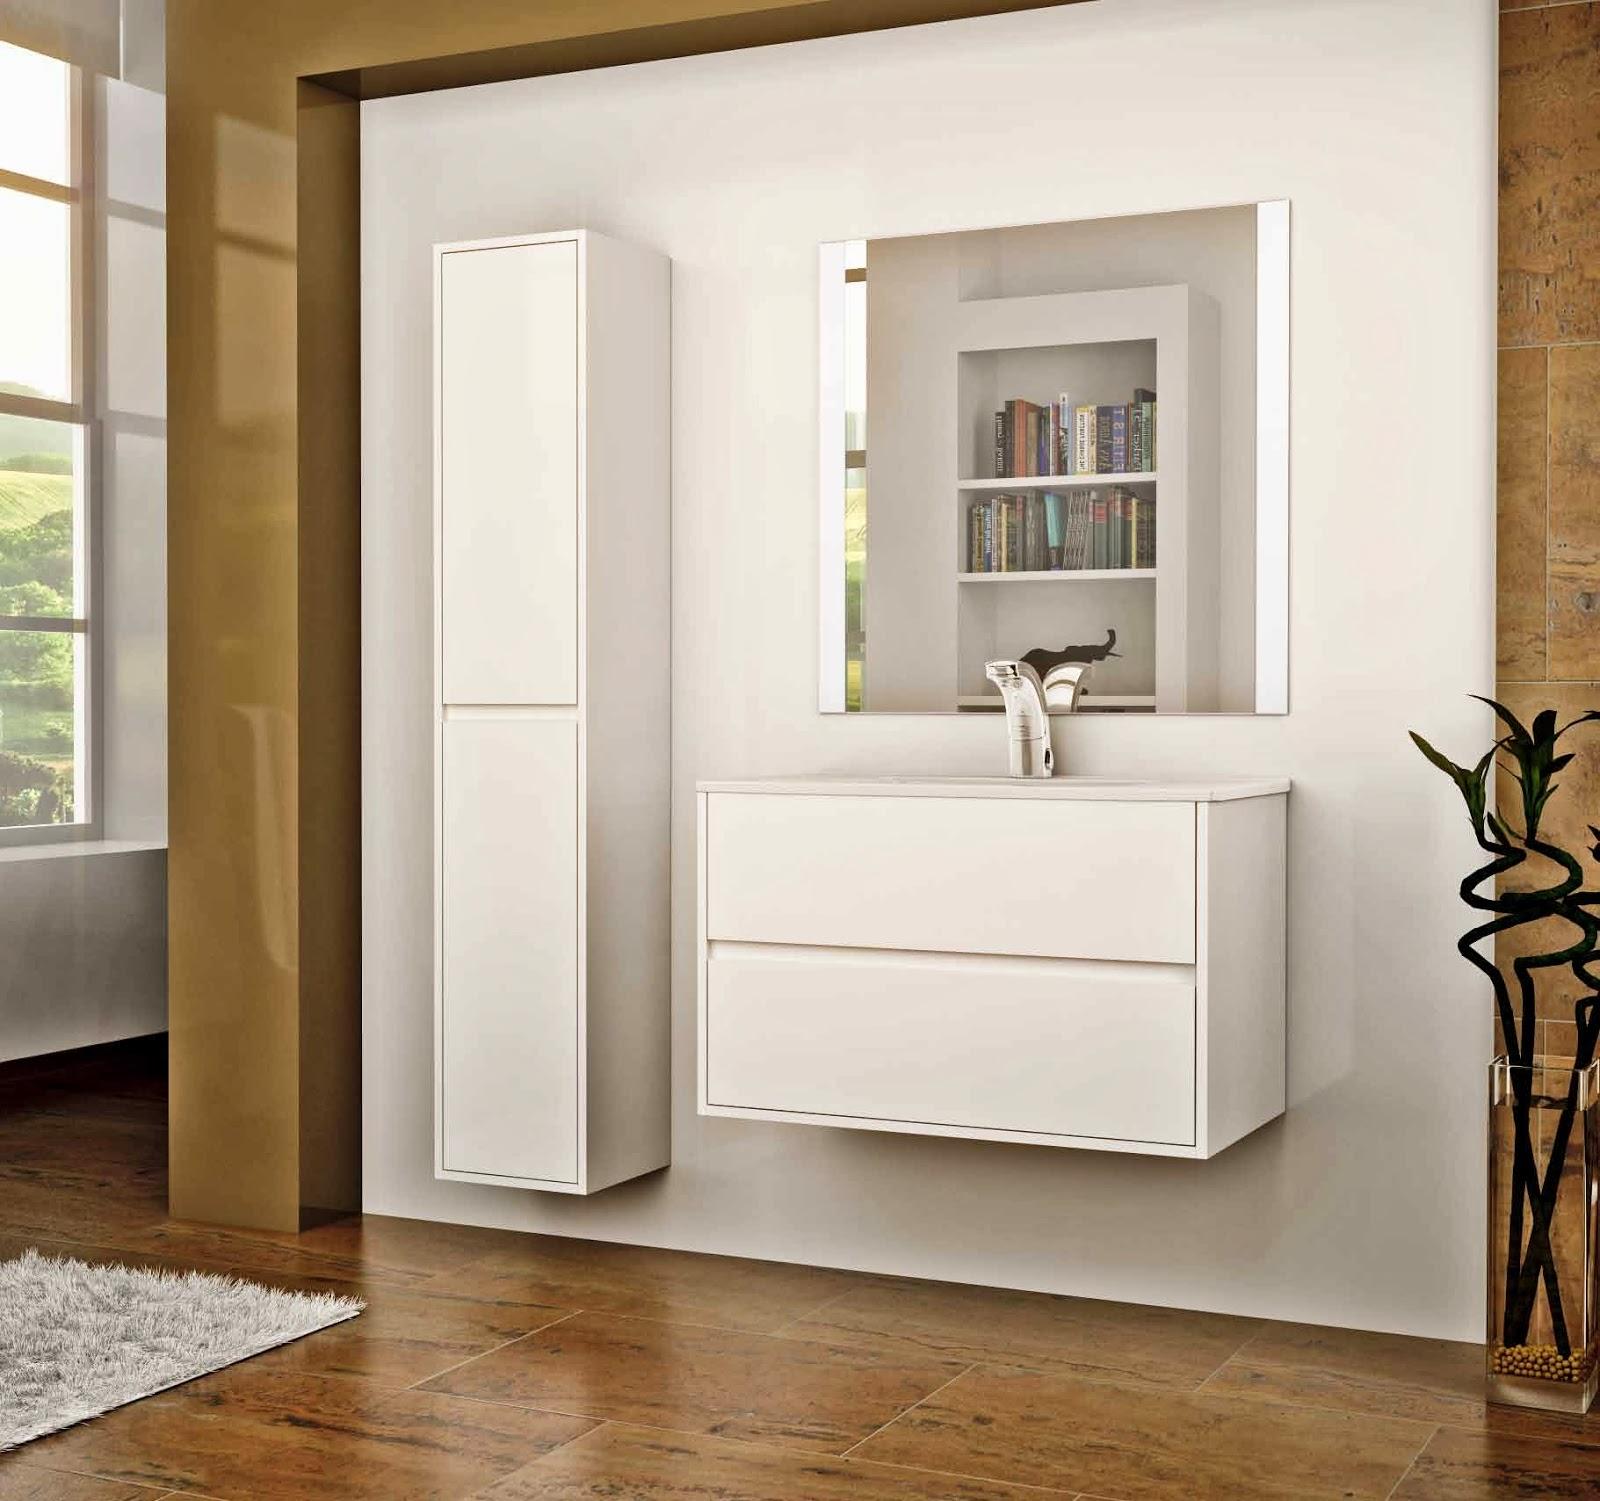 Muebles Bao Blanco Awesome Beautiful Mueble Bao Blanco De Bao  # Muebles Lacados En Blanco Baratos